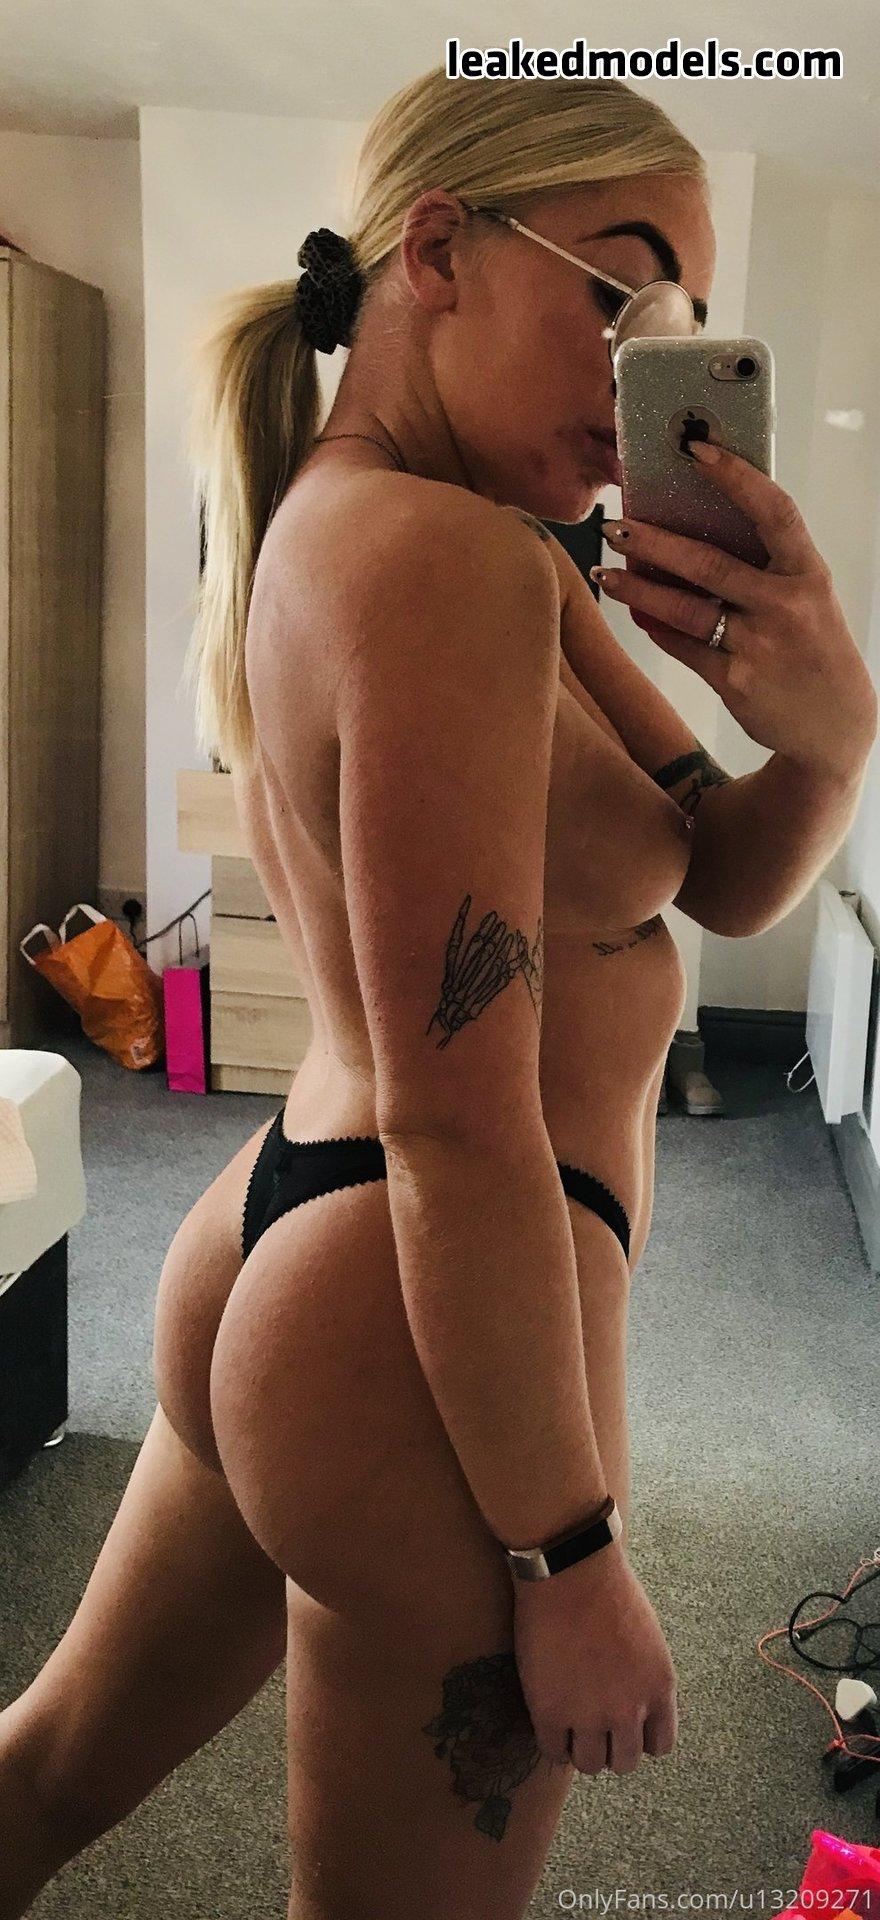 brittany wilkinson – hey_its_britt Twitter Nude Leaks (25 Photos)